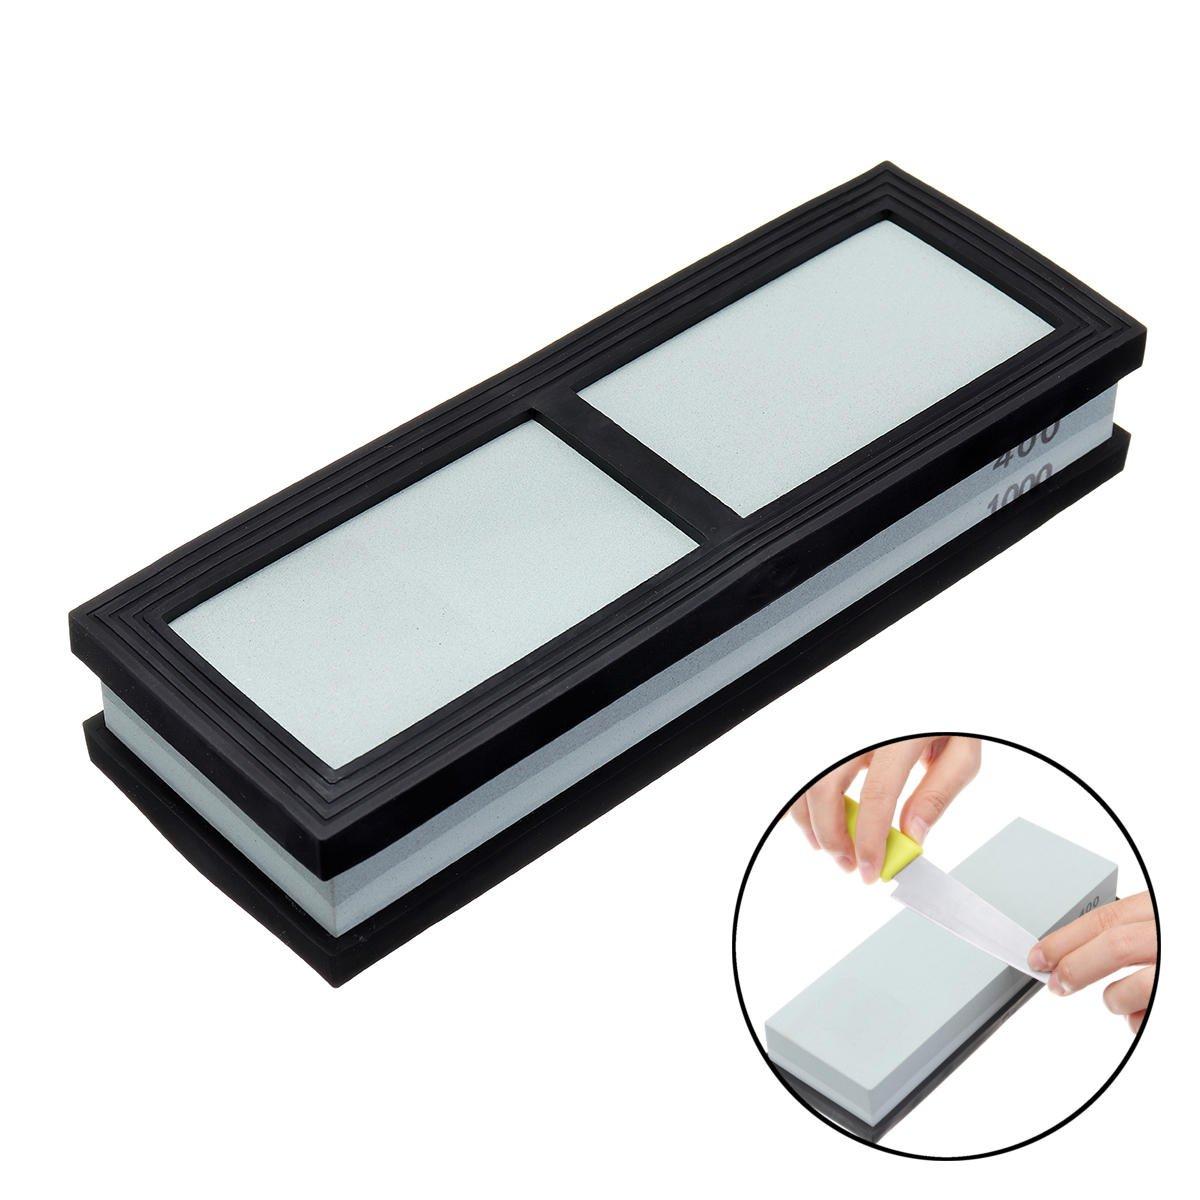 Dual Sided Premium Cutter Sharpen Stone 2 Side Grit Waterstone Best Whetstone Sharpener